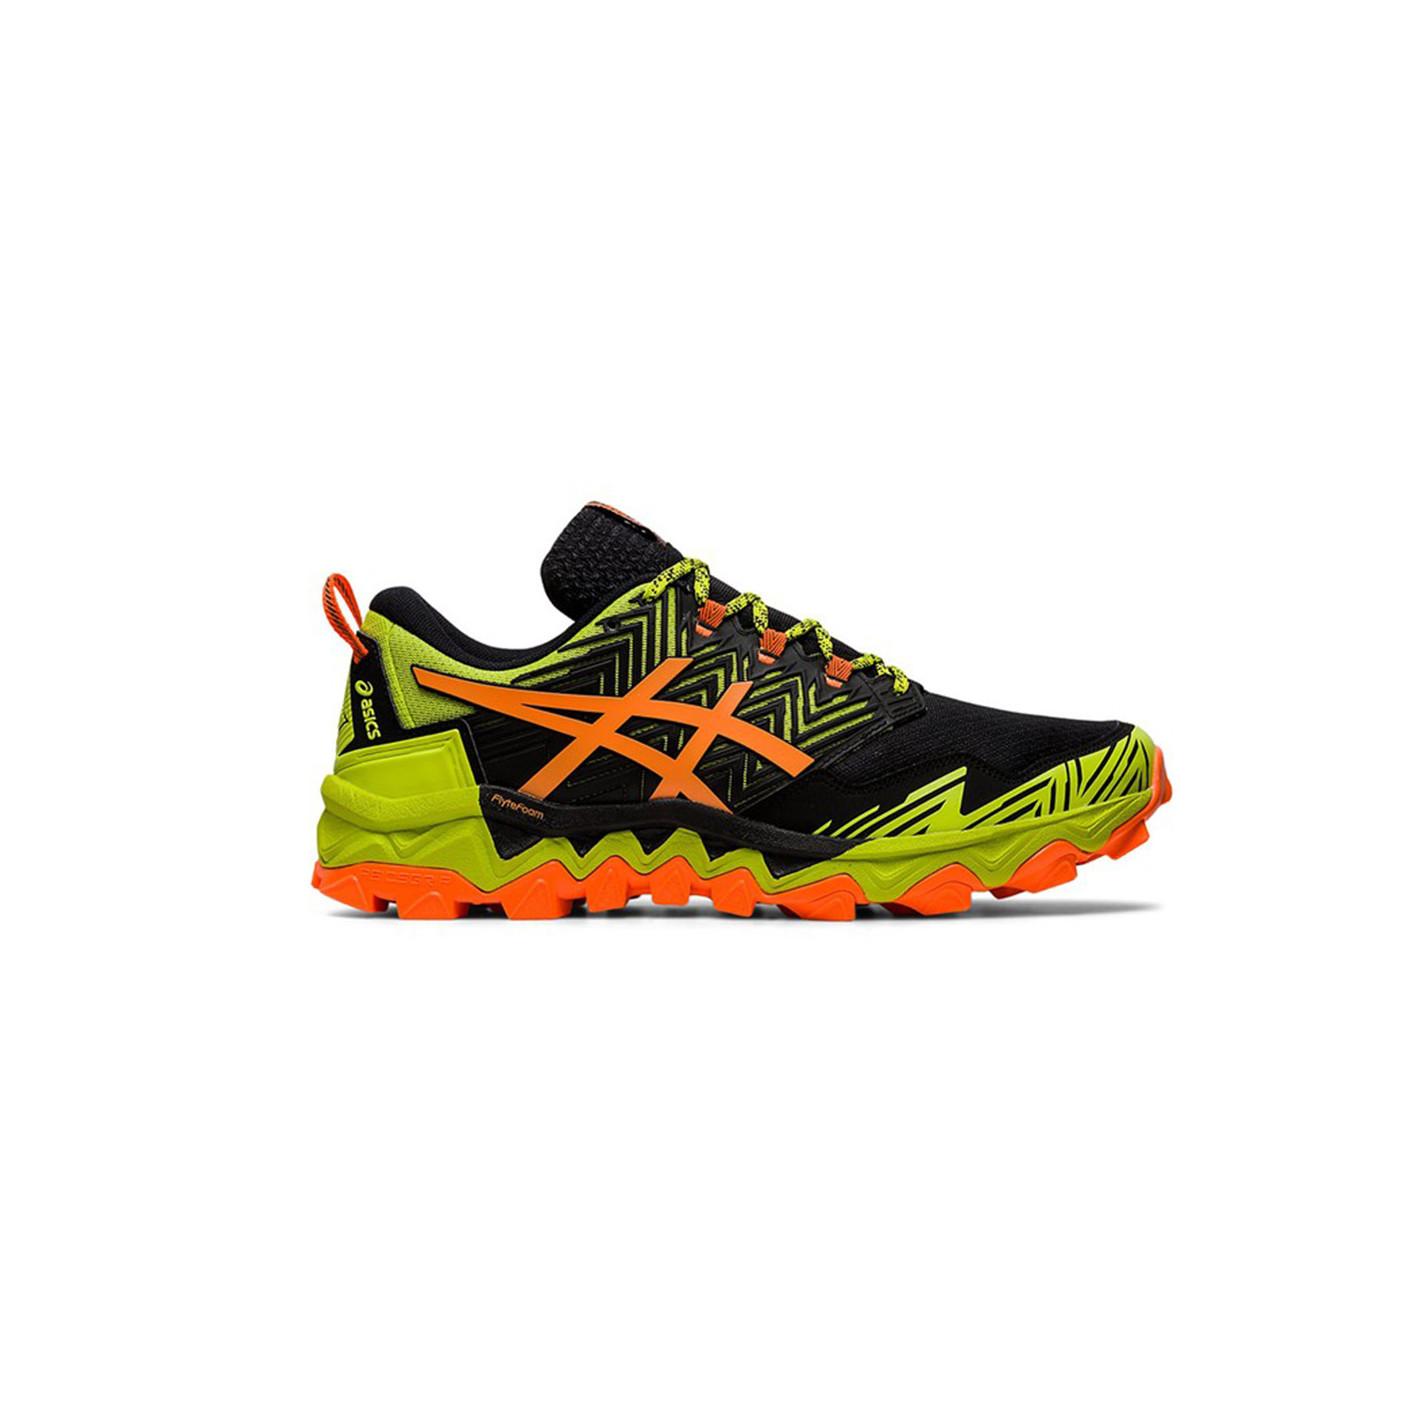 Chaussures Running ASICS Homme GEL-FUJITRABUCO 8 Jaune / Noir ...